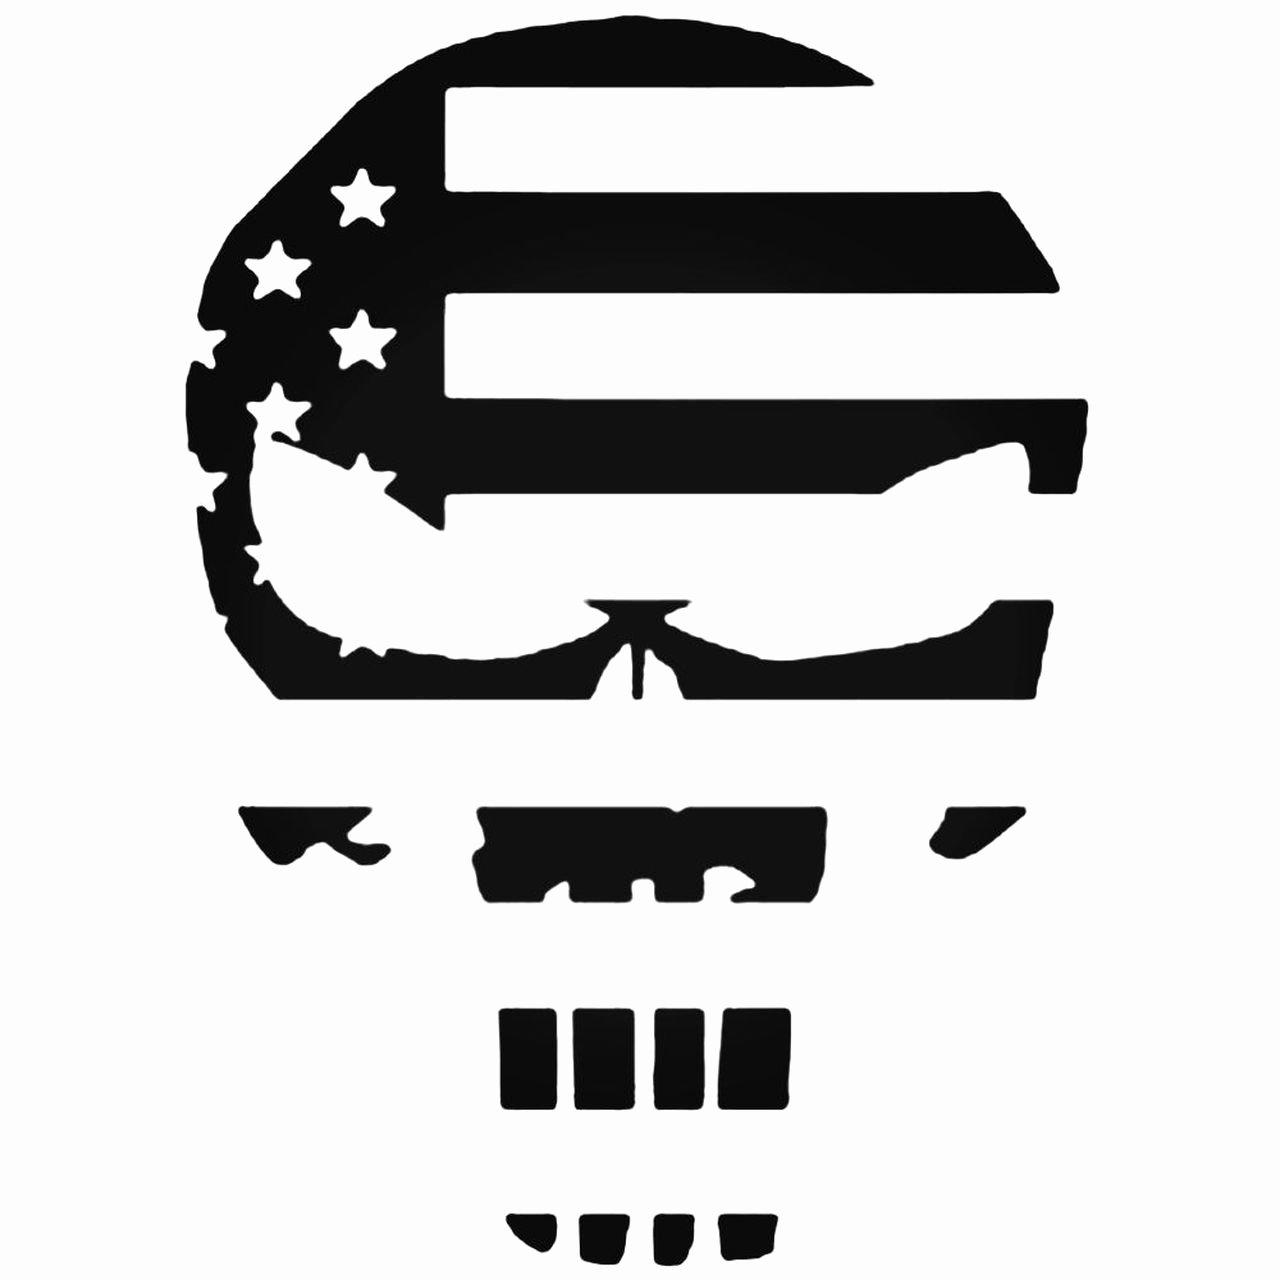 Free Printable American Flag Star Stencil New Chris Kyle American Flag Punisher Skull Decal Sticker